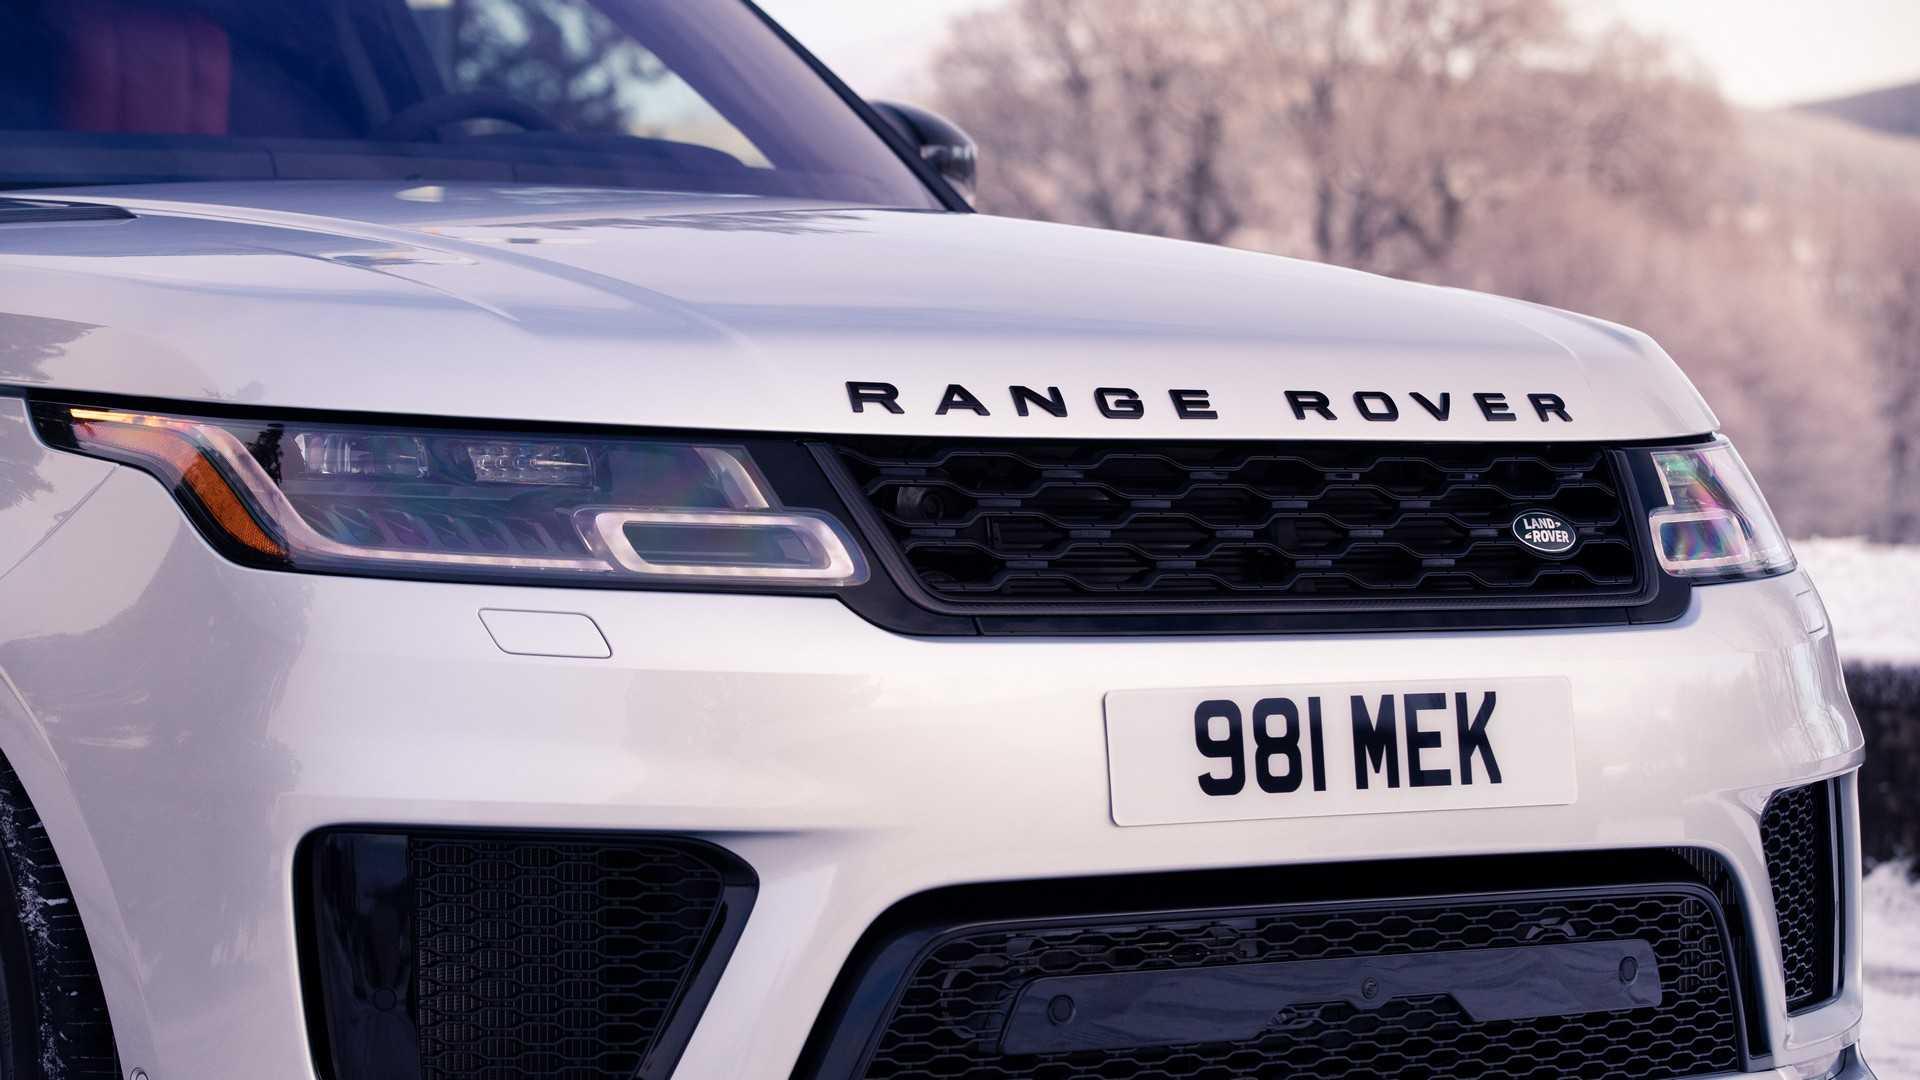 range-rover-sport-hstrange-rover-sport-hst-trinh-lang-8.jpg